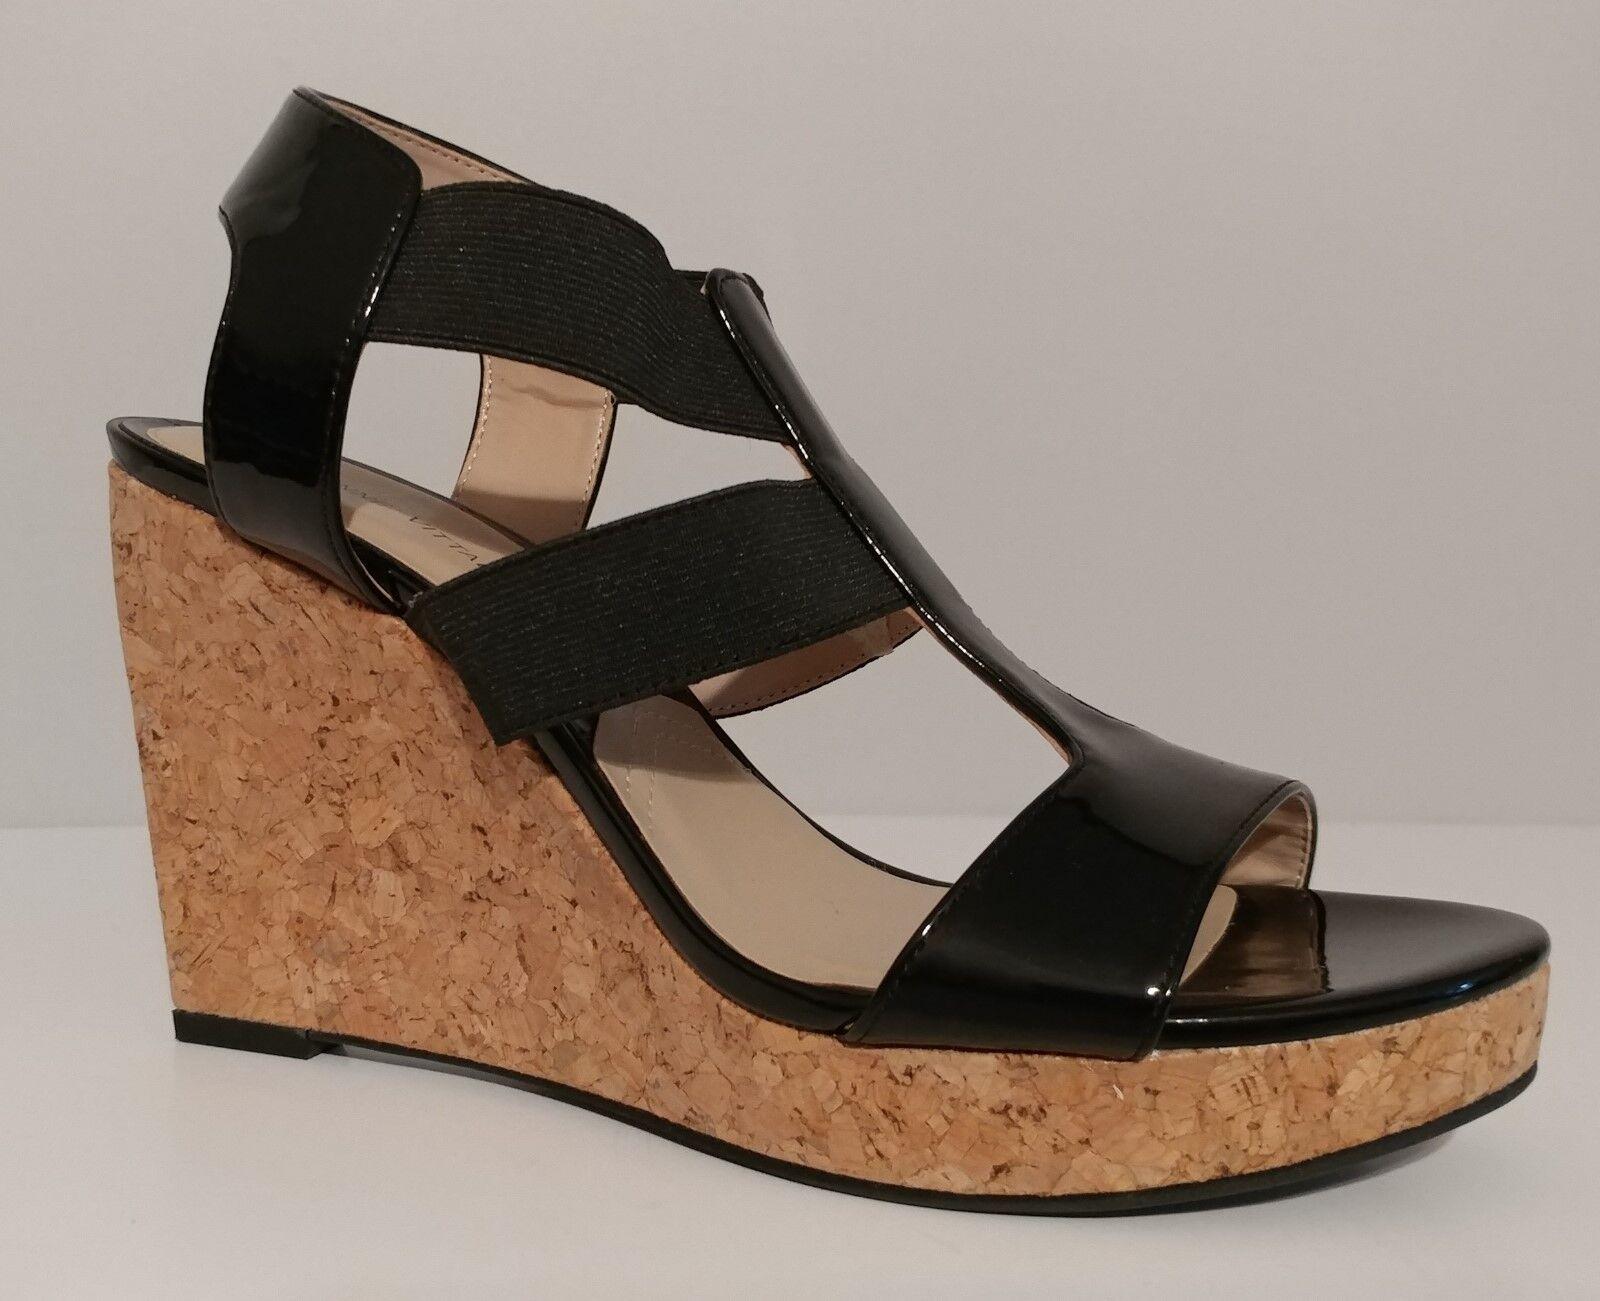 Nuevo    Sandalias De Cuña Negro Adrienne Adrienne Adrienne Vittadini Chari Taco de 4  tamaño 9.5M Estados Unidos 39.5M EUR  en linea